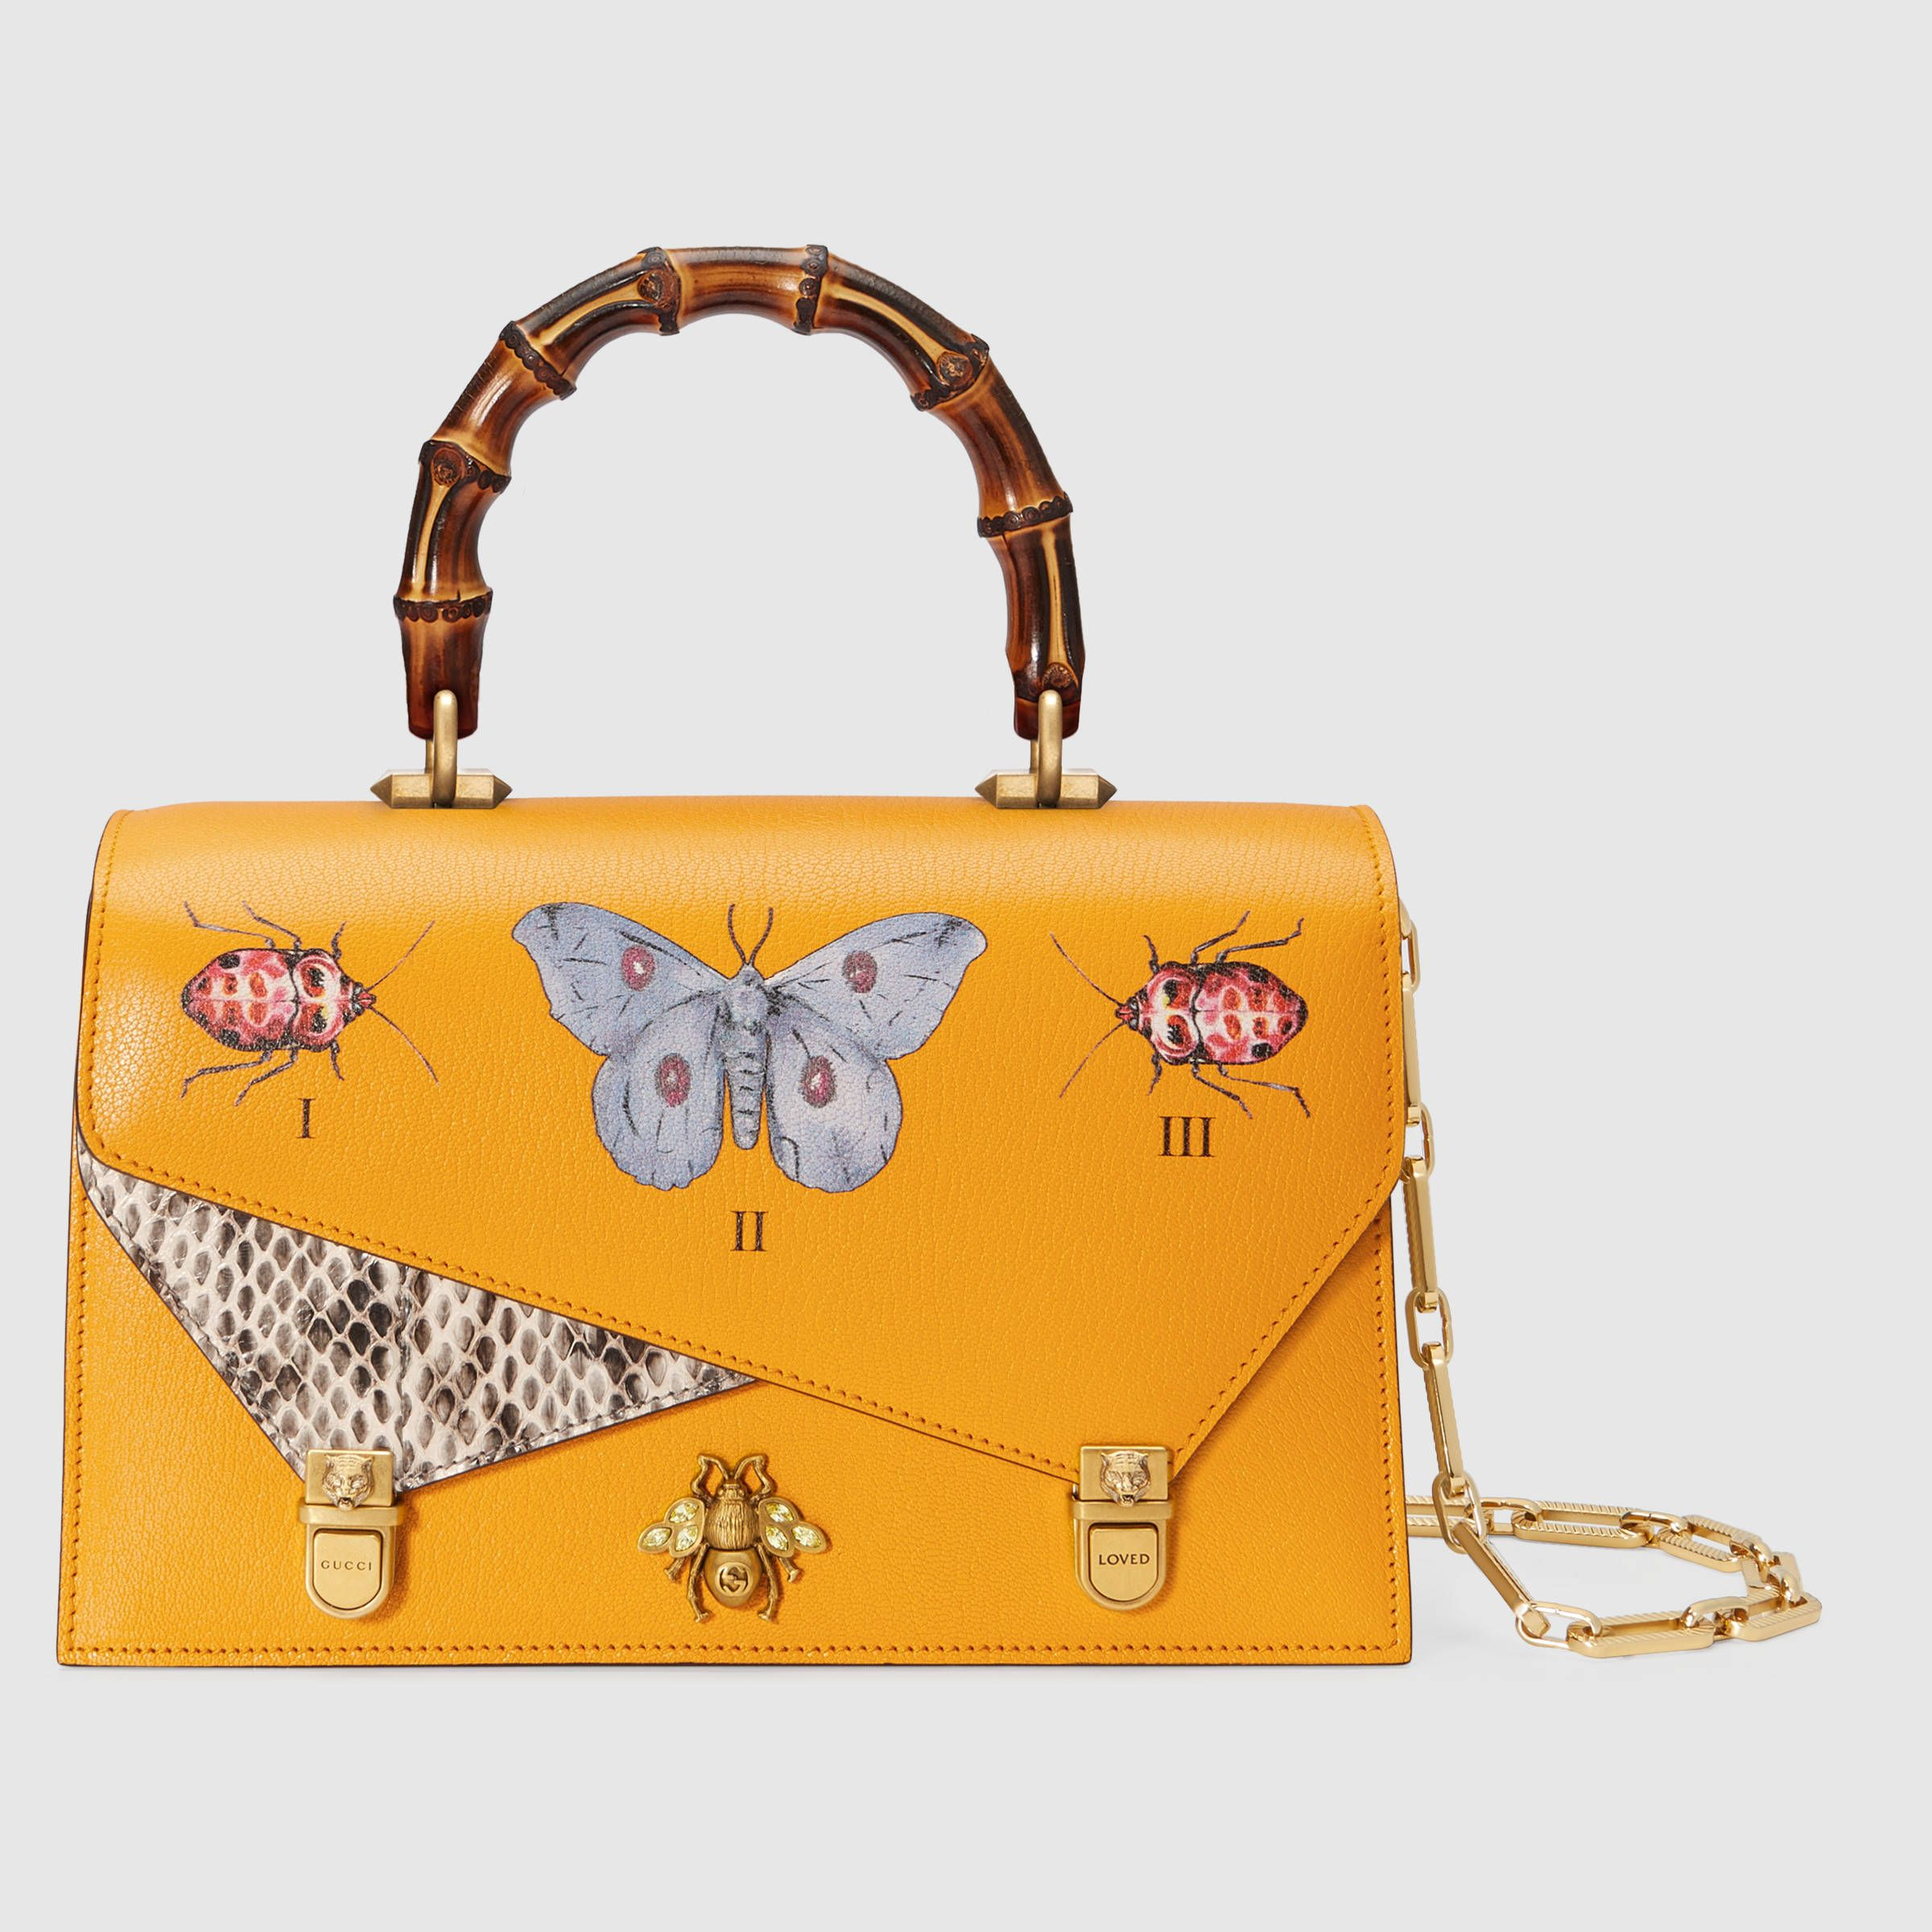 43ab0eb5c9433a Ottilia leather small top handle | bir | White leather handbags ...